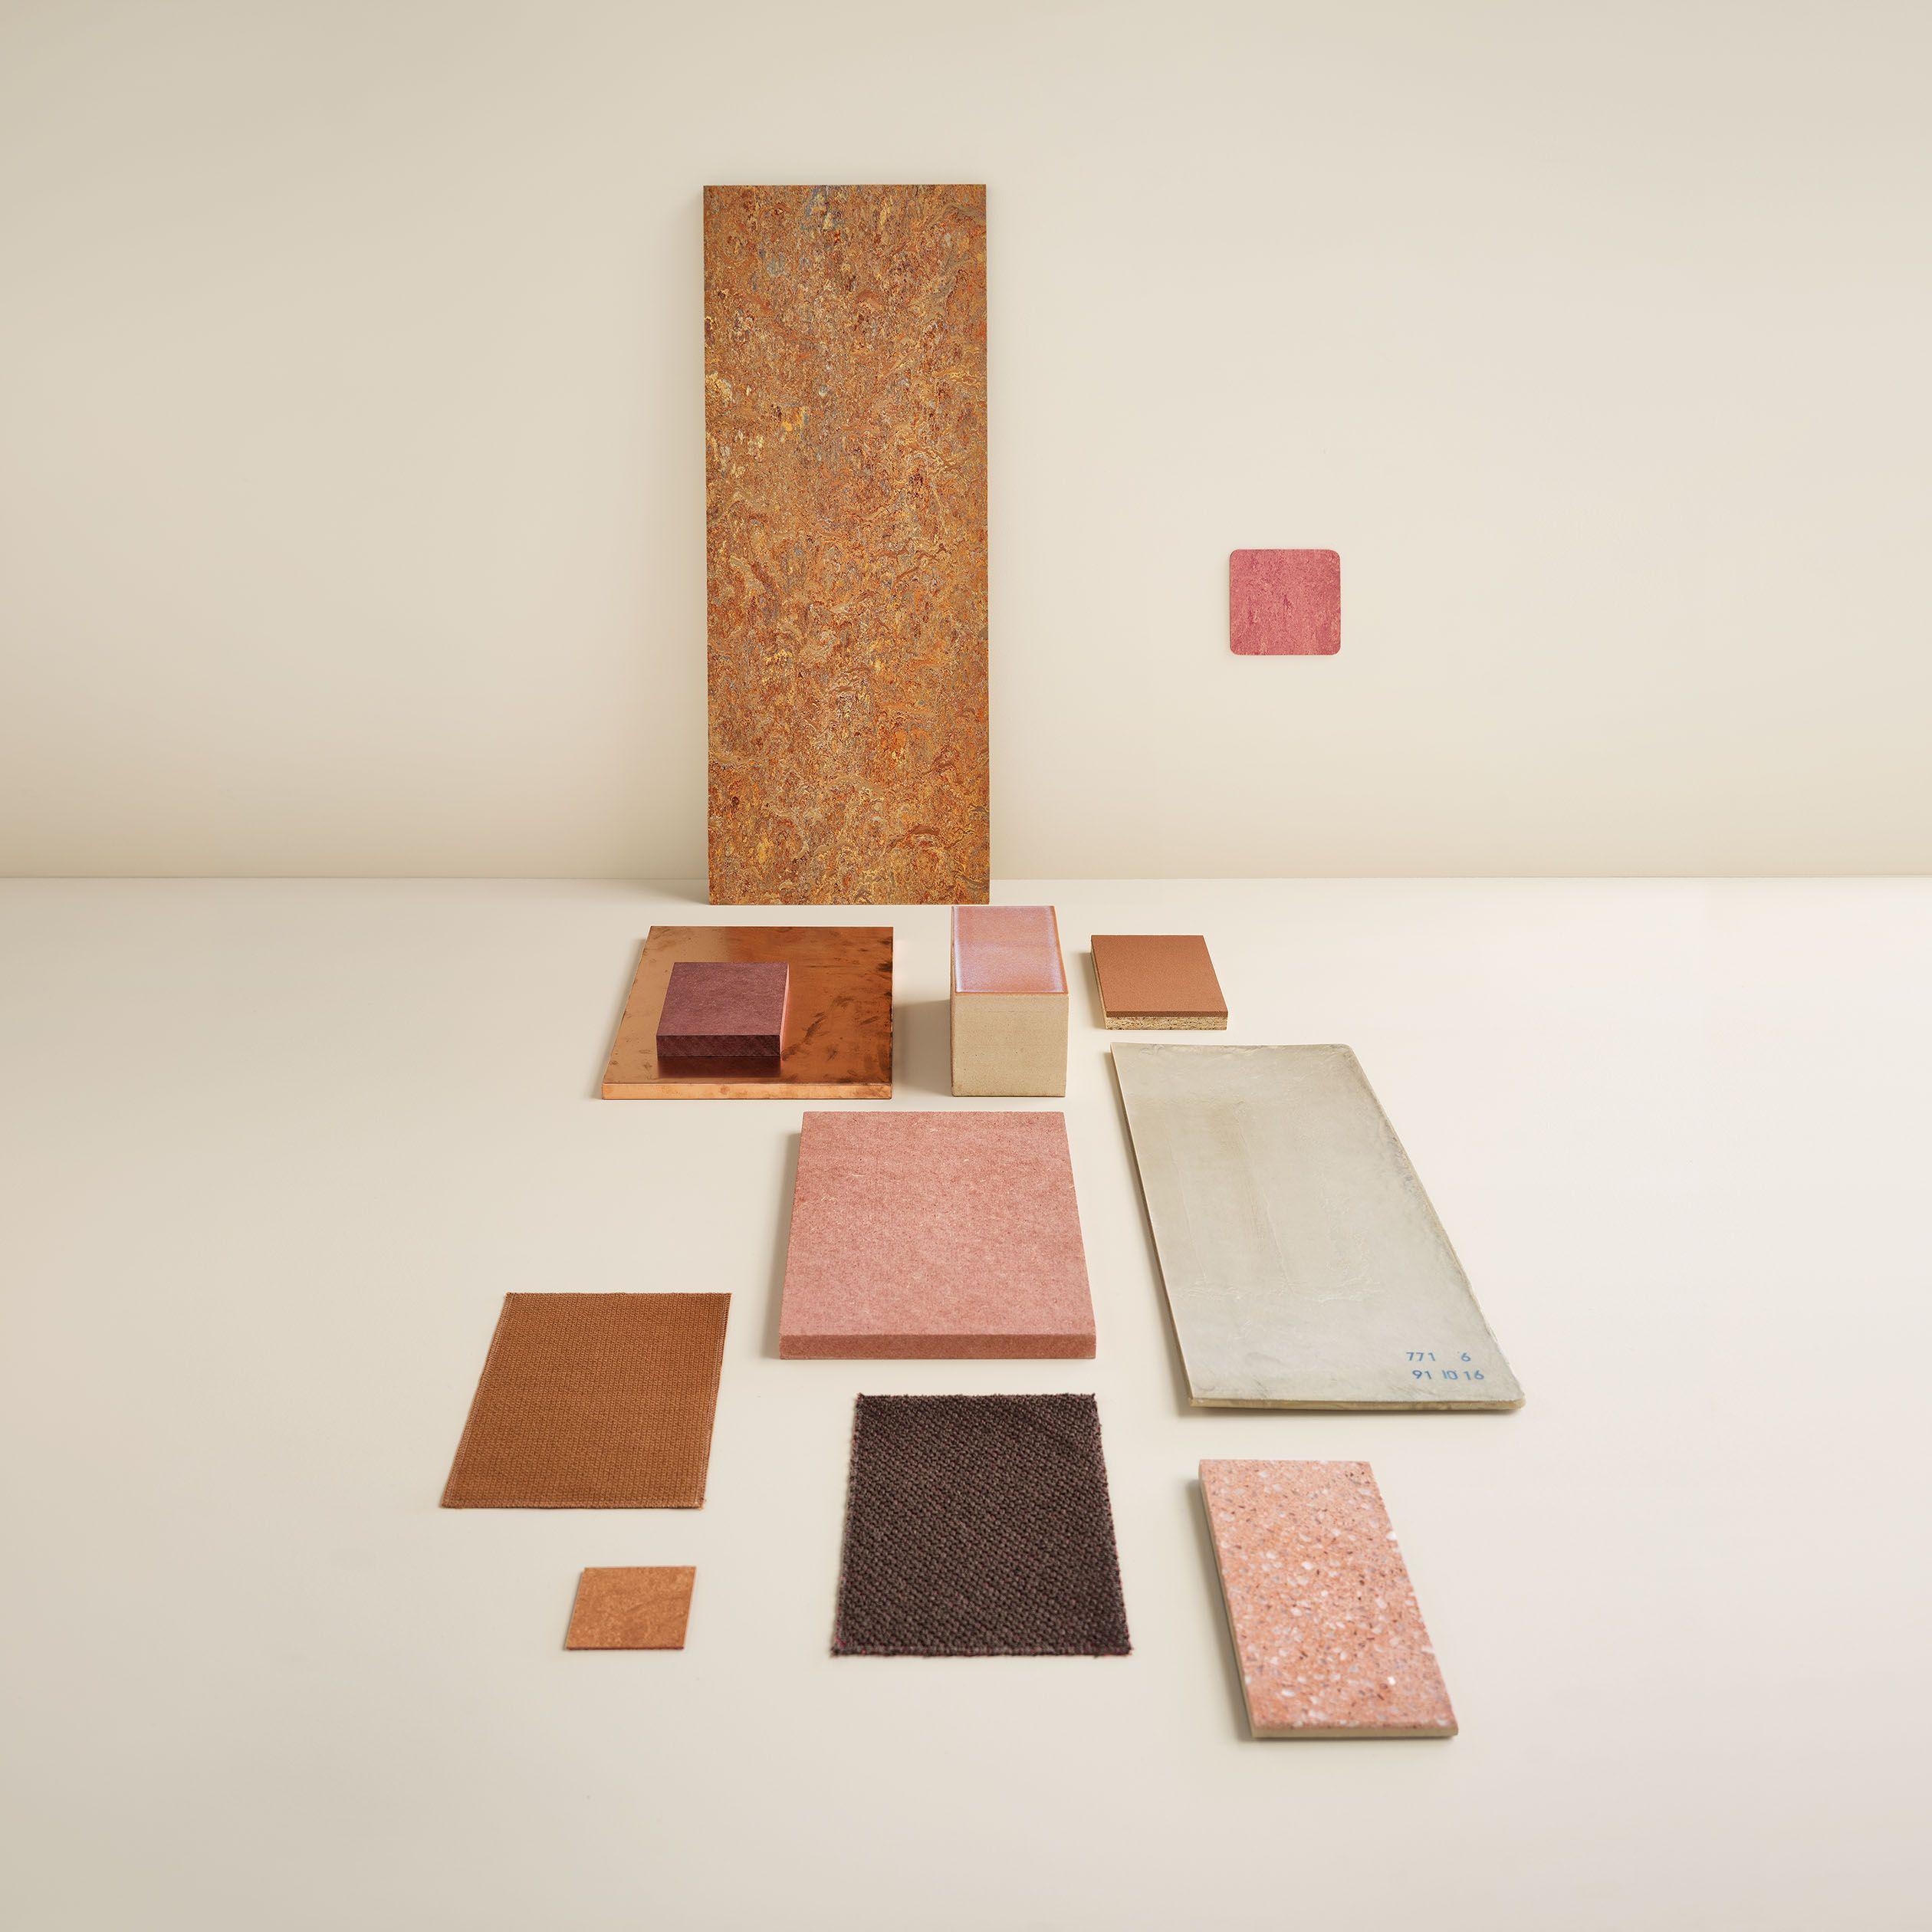 Marmoleum linoleum flooring by Forbo Natural surfaces